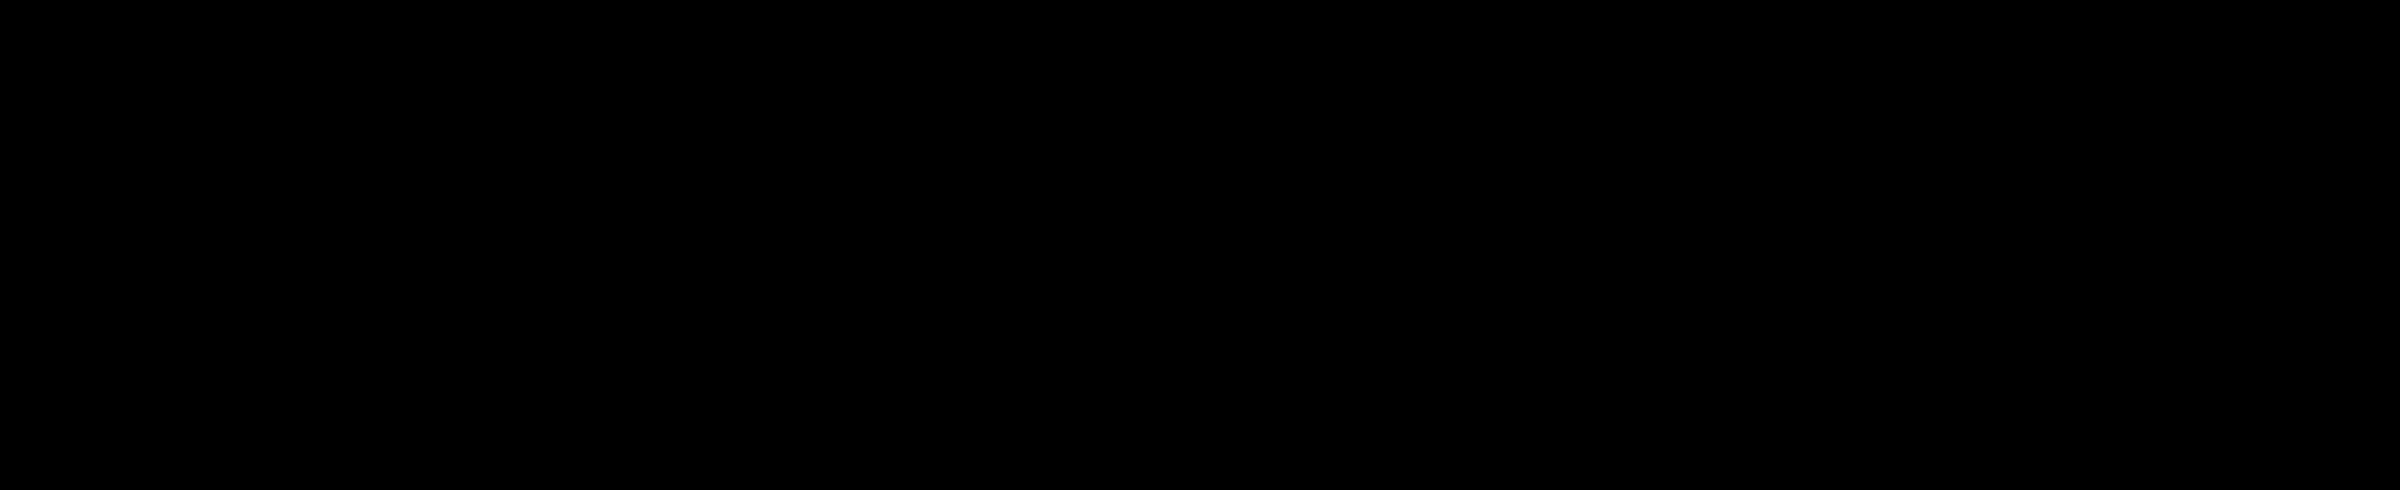 New York Times Logo PNG Transparent & SVG Vector.